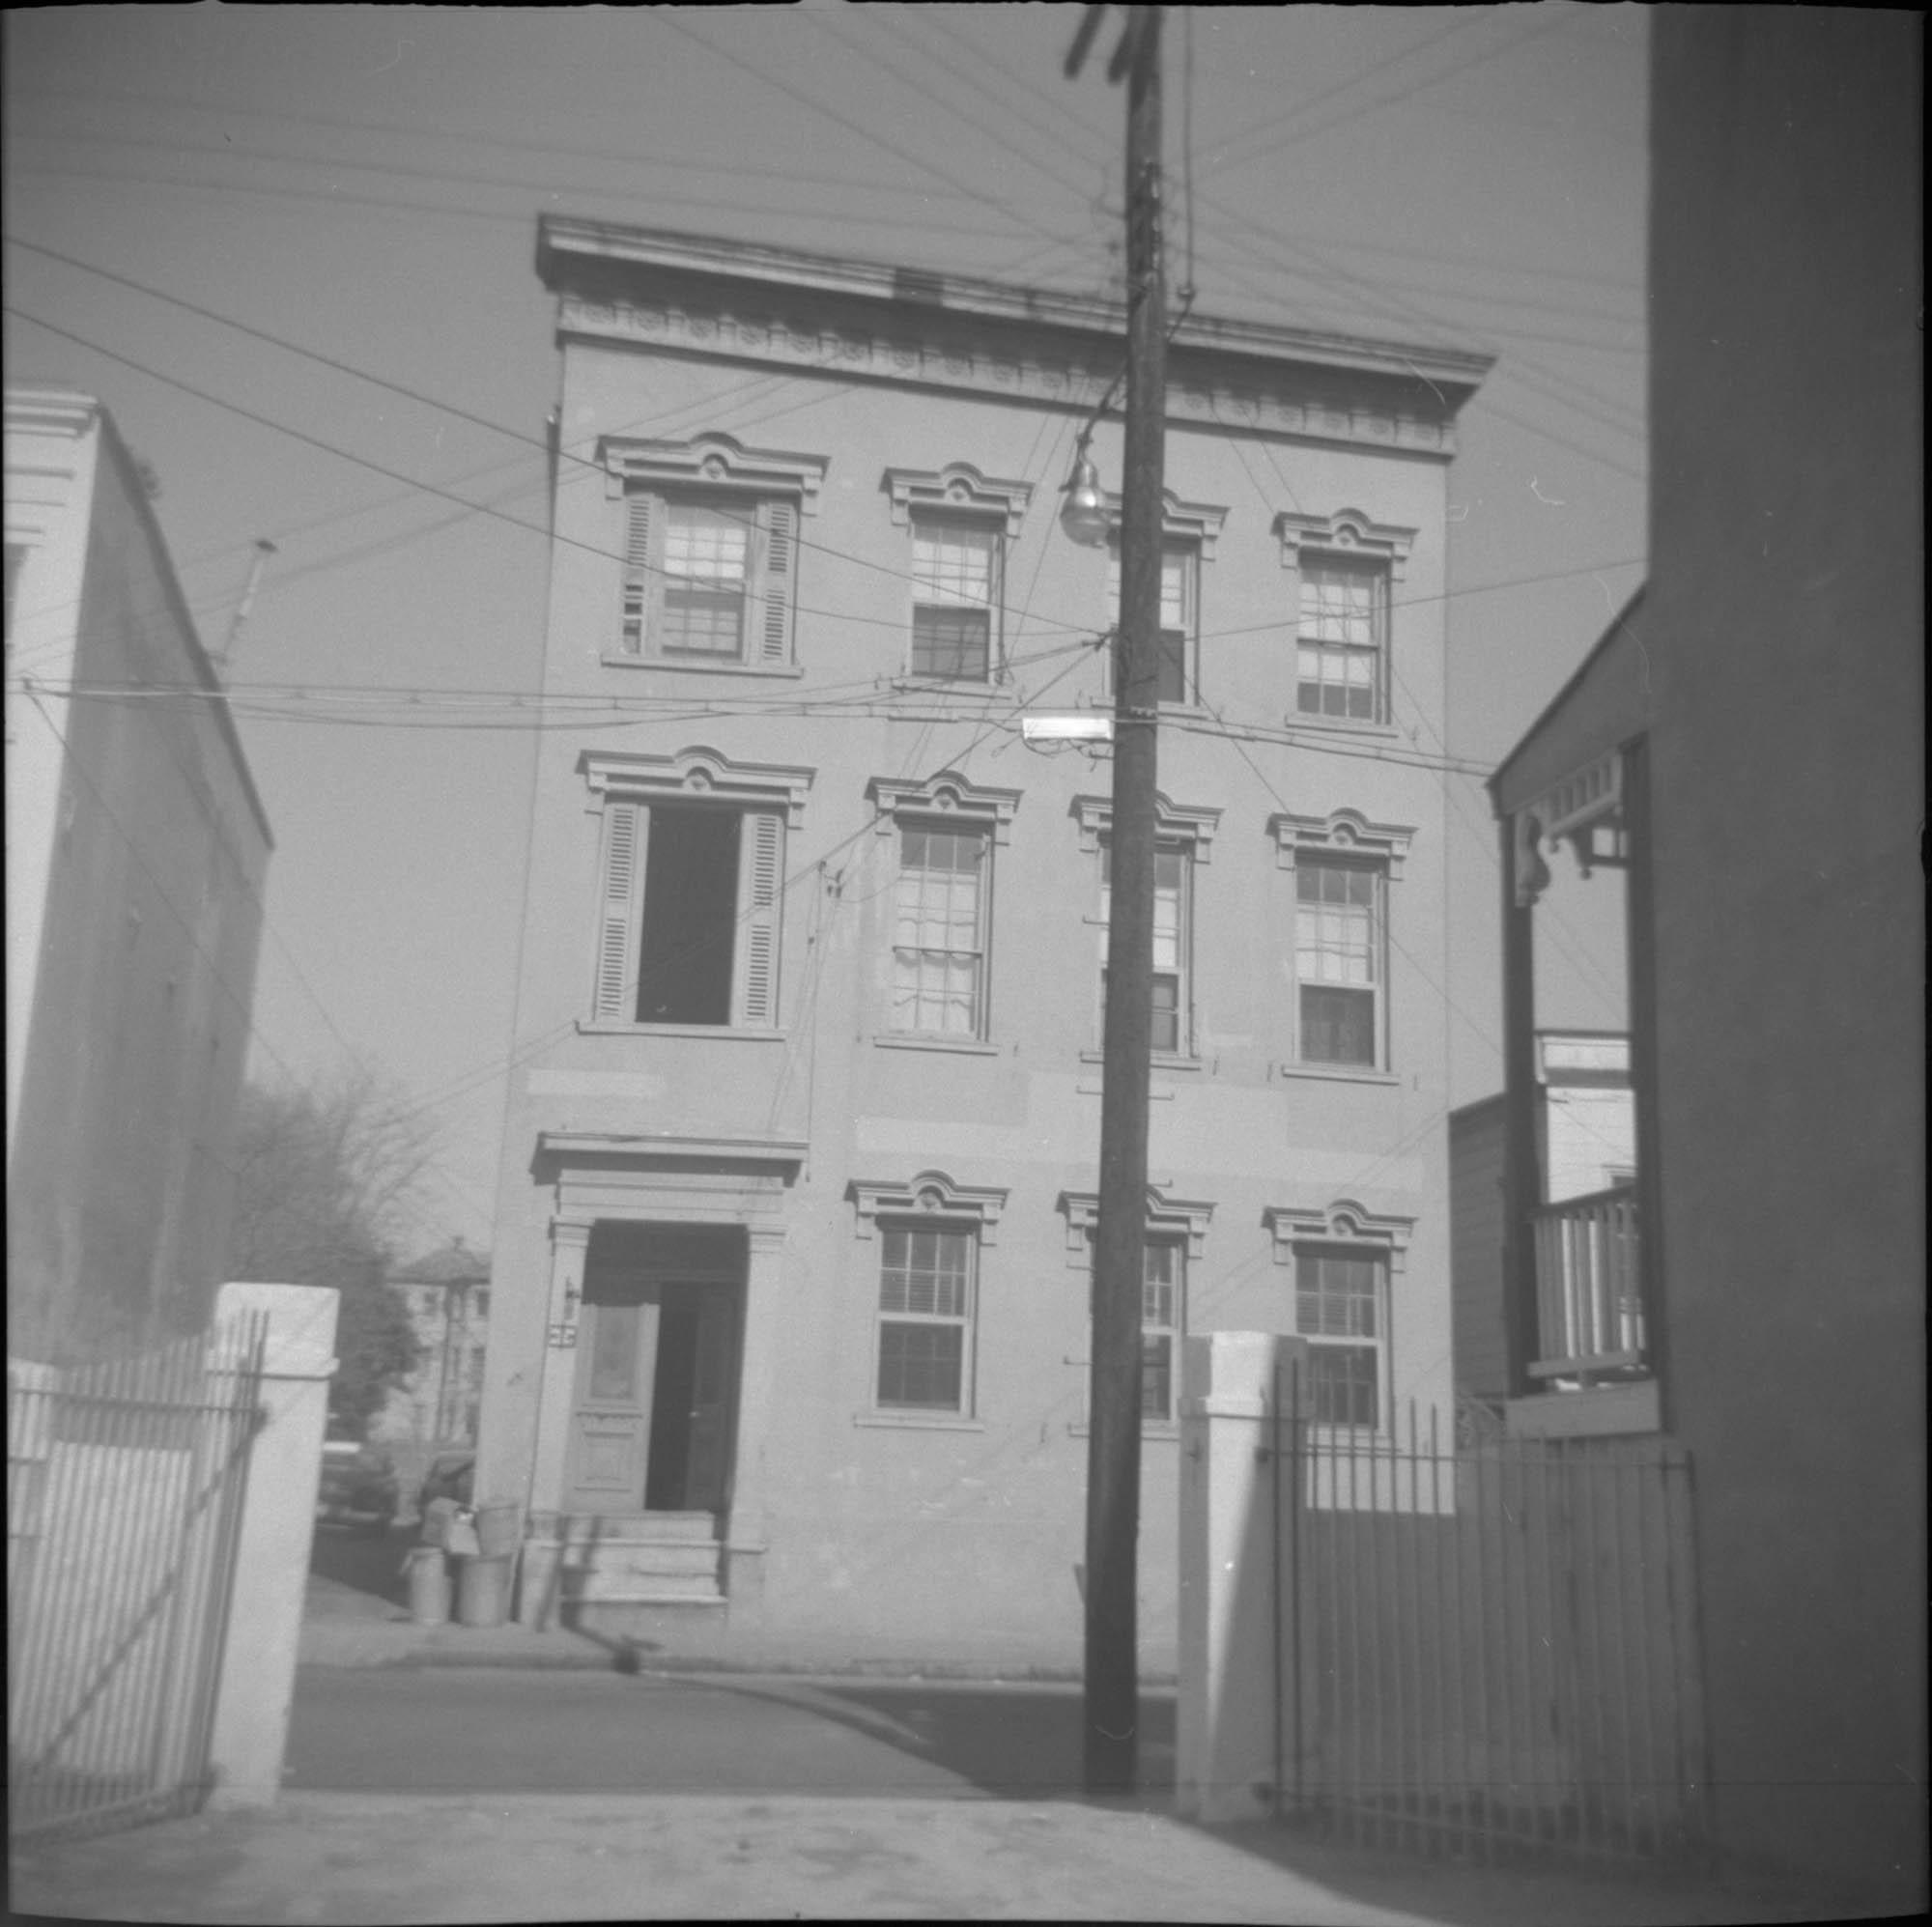 62 Society Street